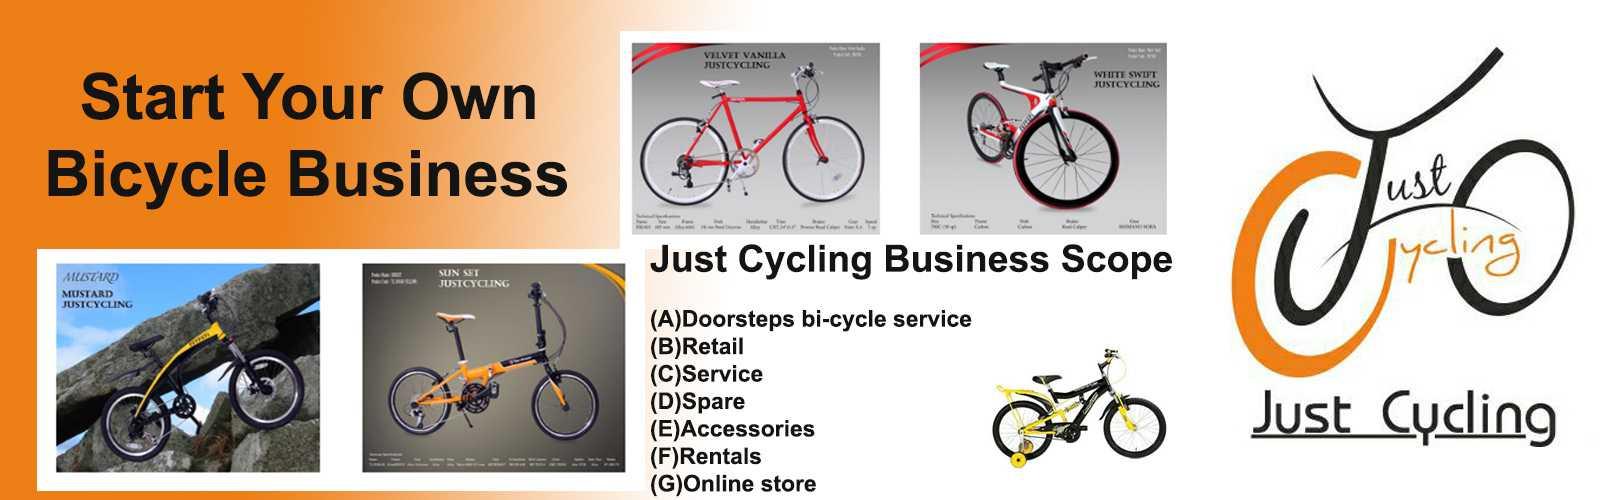 admin/photos/Just Cycling